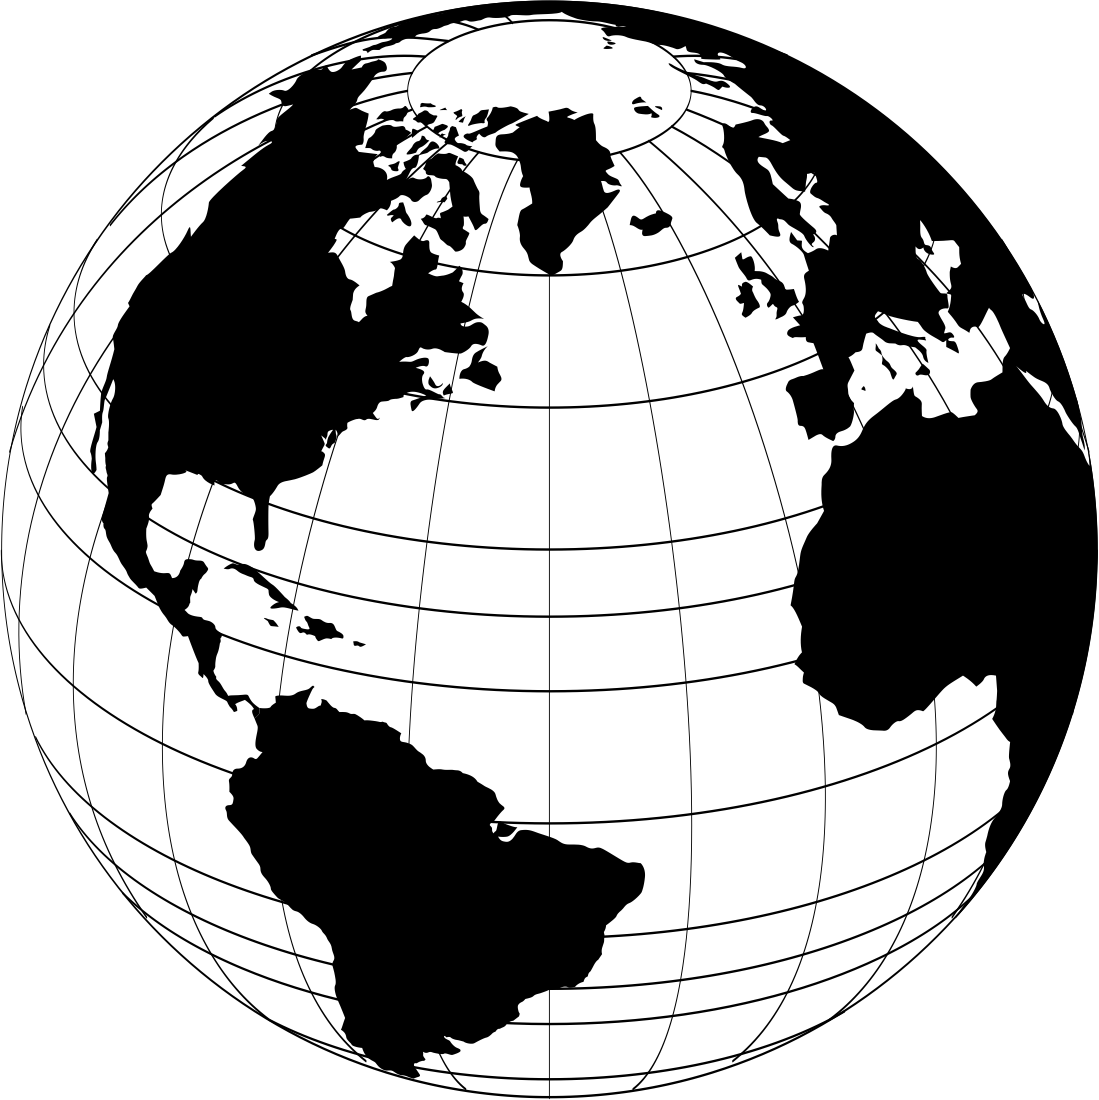 World Globe File Free CDR Vectors Art